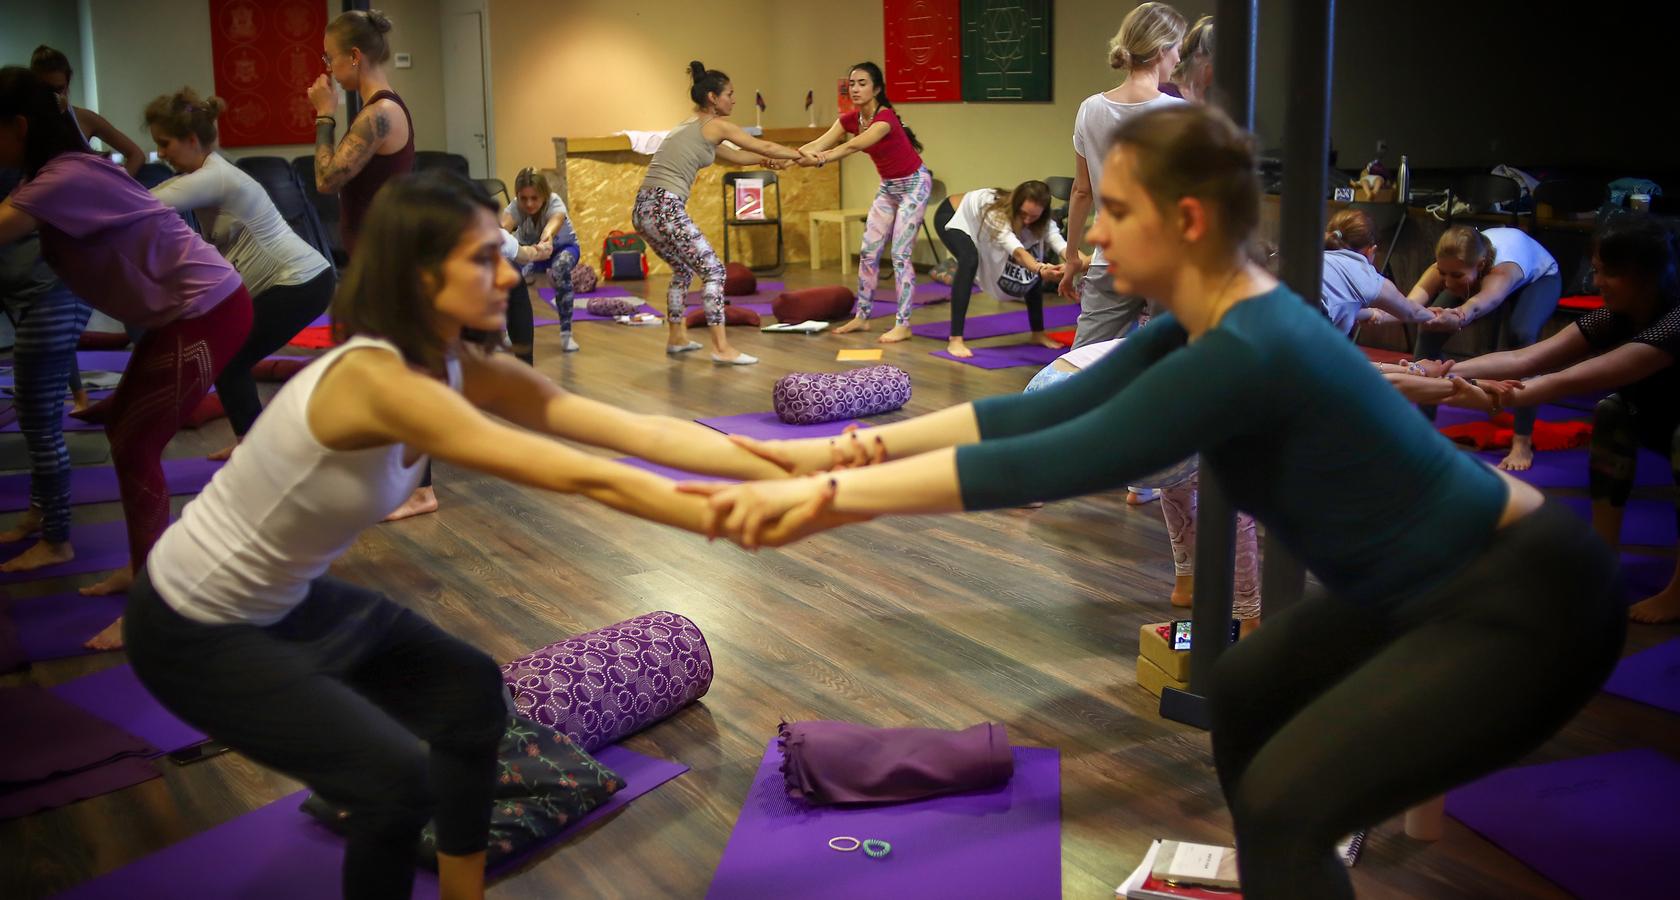 курсы женской йоги